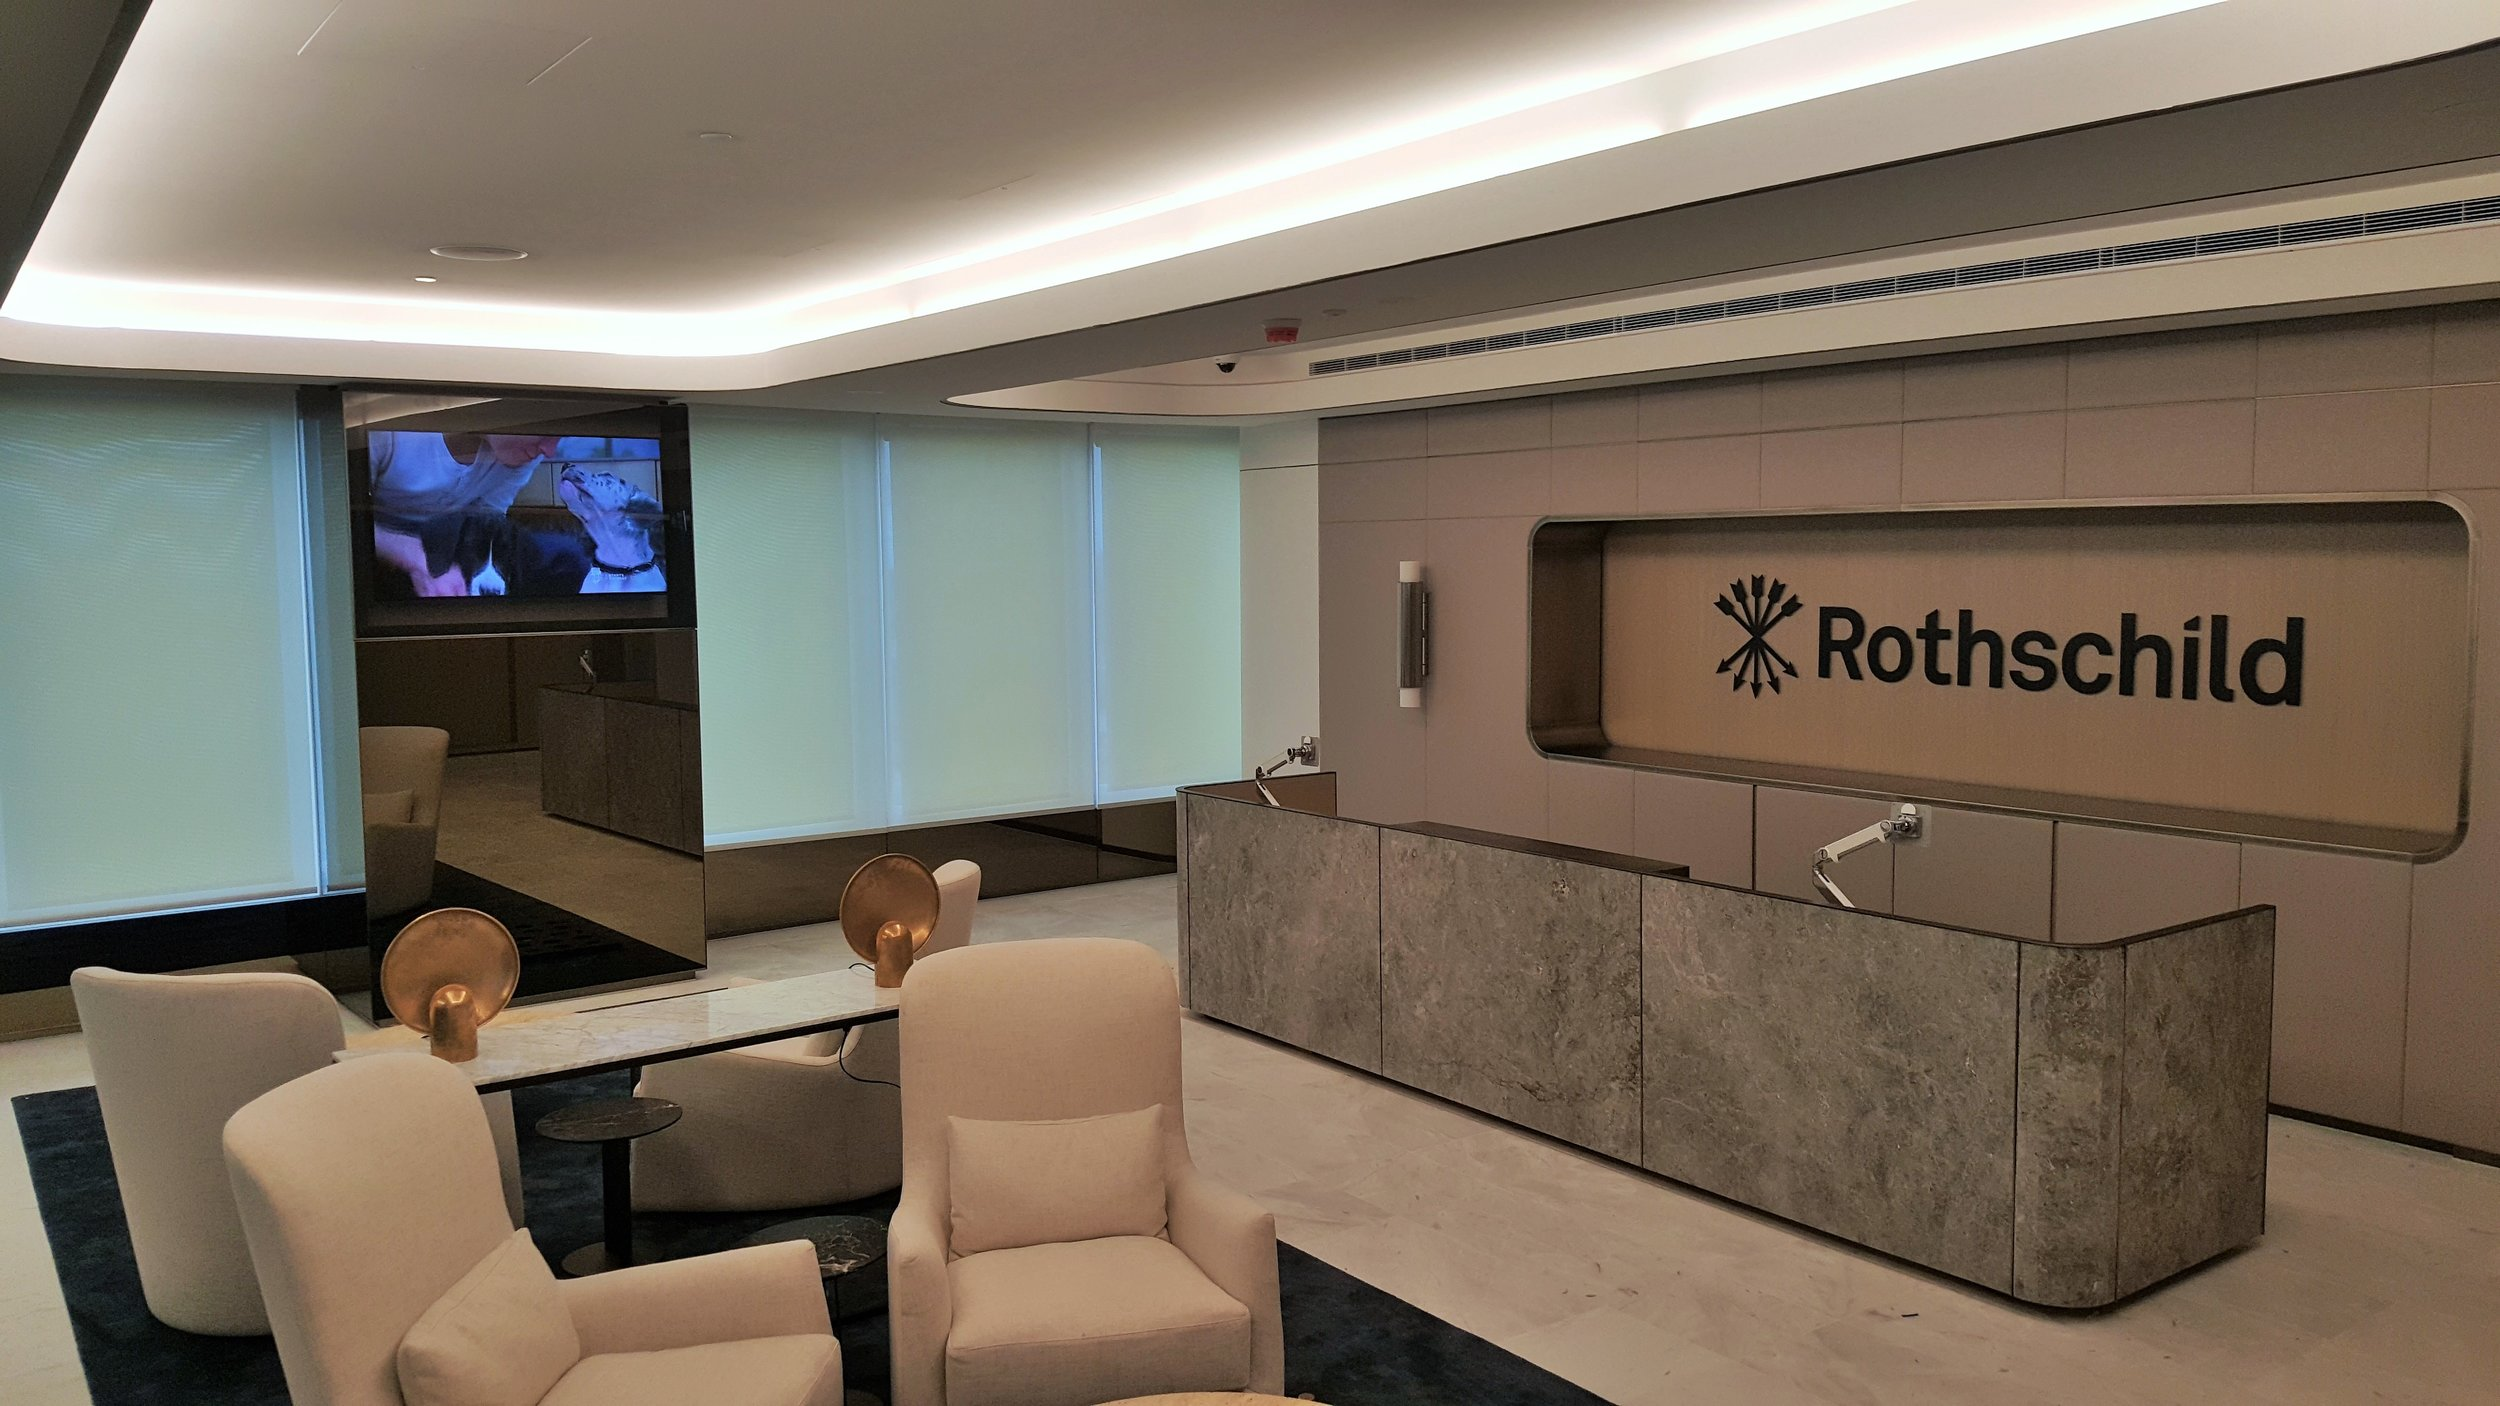 Rothschild .jpg